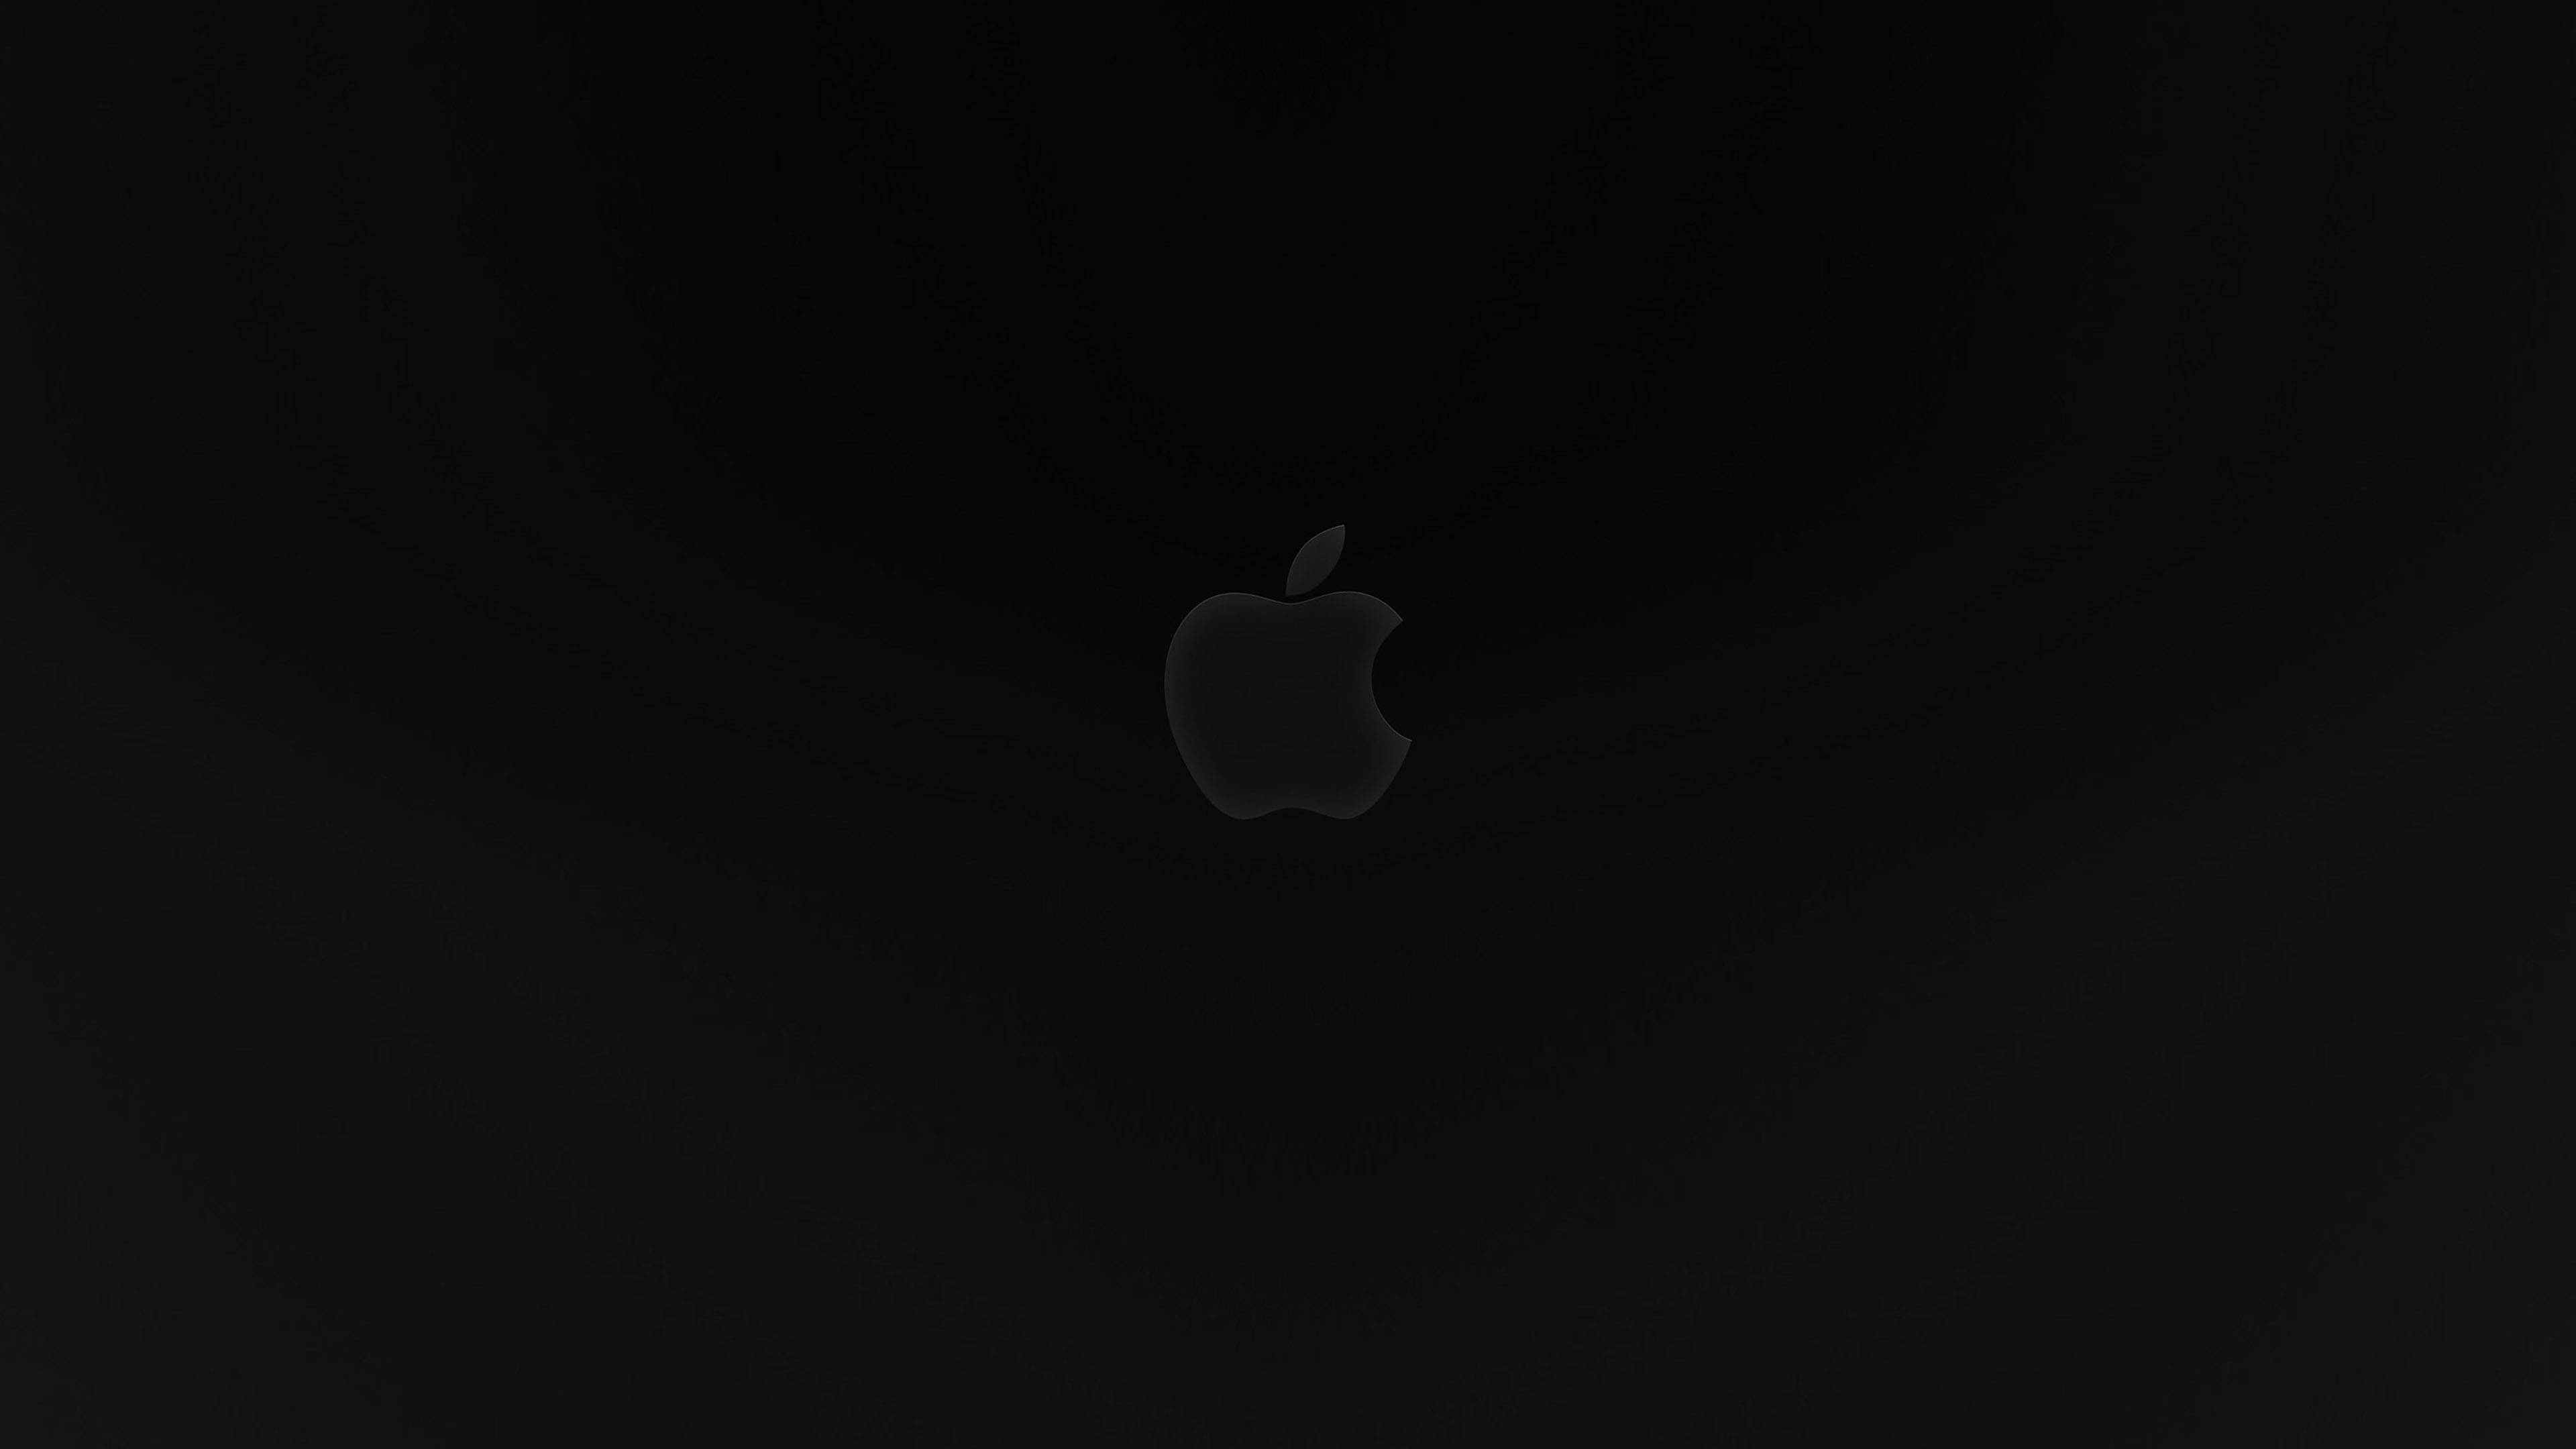 Ac96 Wallpaper Apple Iphone6 Plus Ios8 Flower Green: Ad89-apple-logo-dark-ios8-iphone6